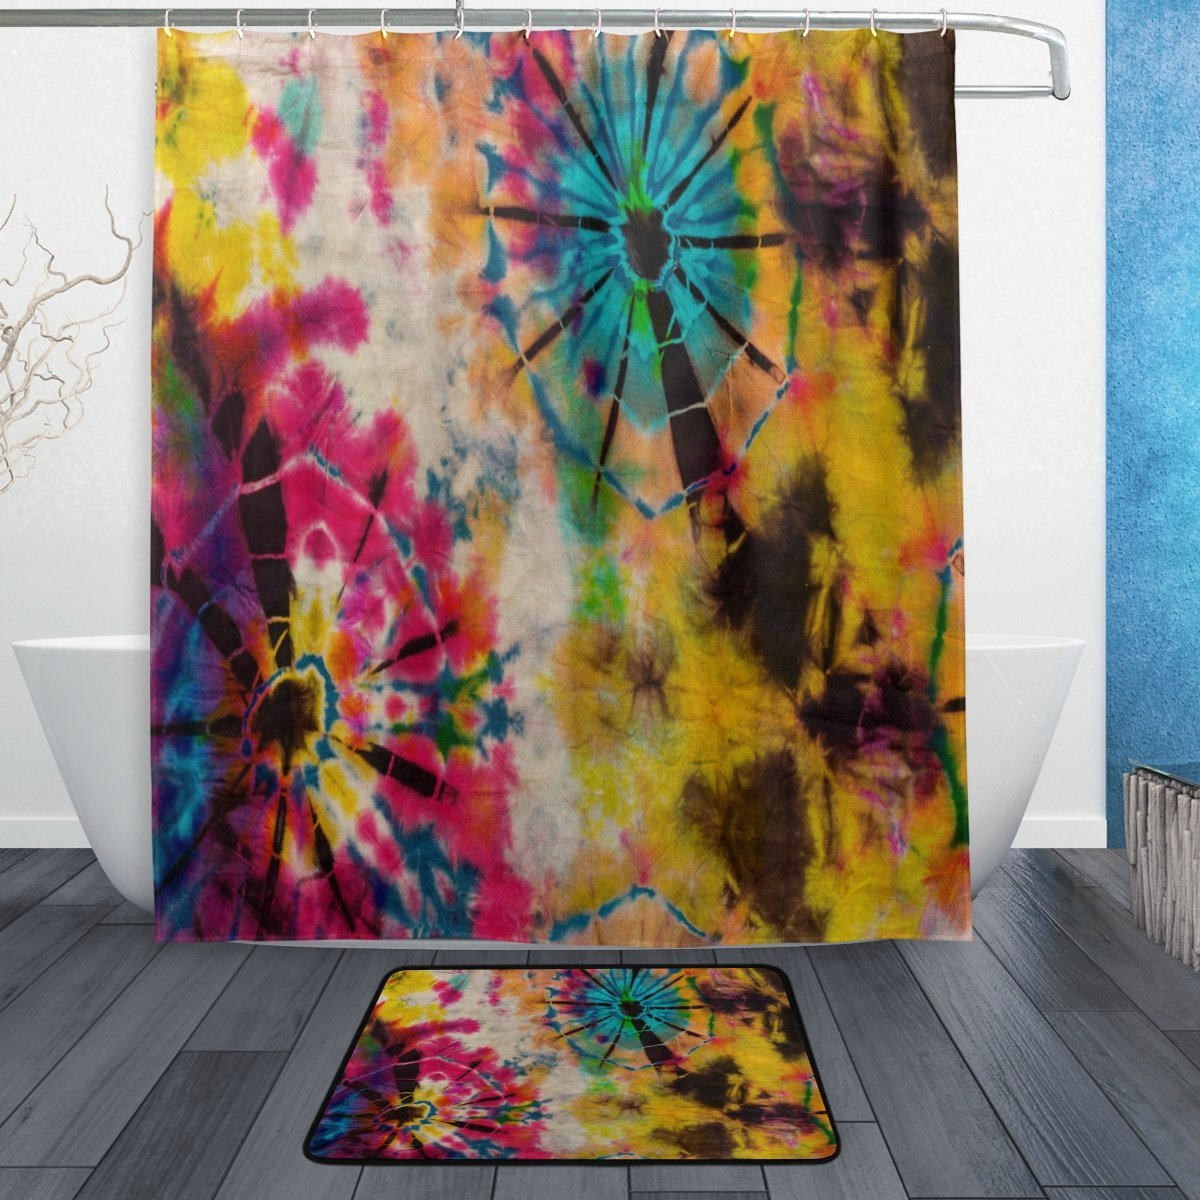 Tie Dye Shower Curtain And Mat Set Tribal Ethnic Waterproof Fabric Bathroom